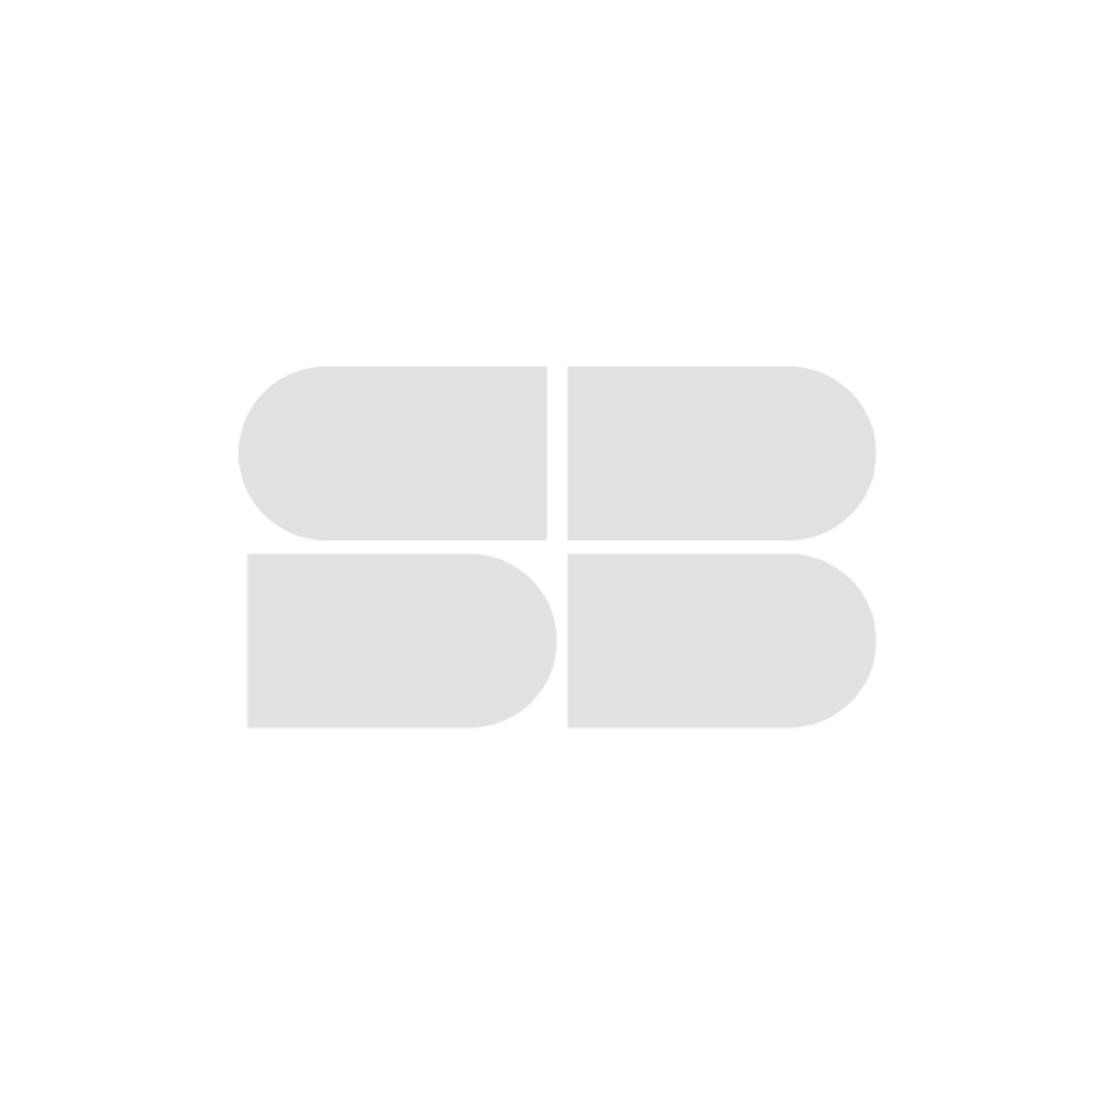 39015241-health-fitness-massage-equipment-massage-chairs-01